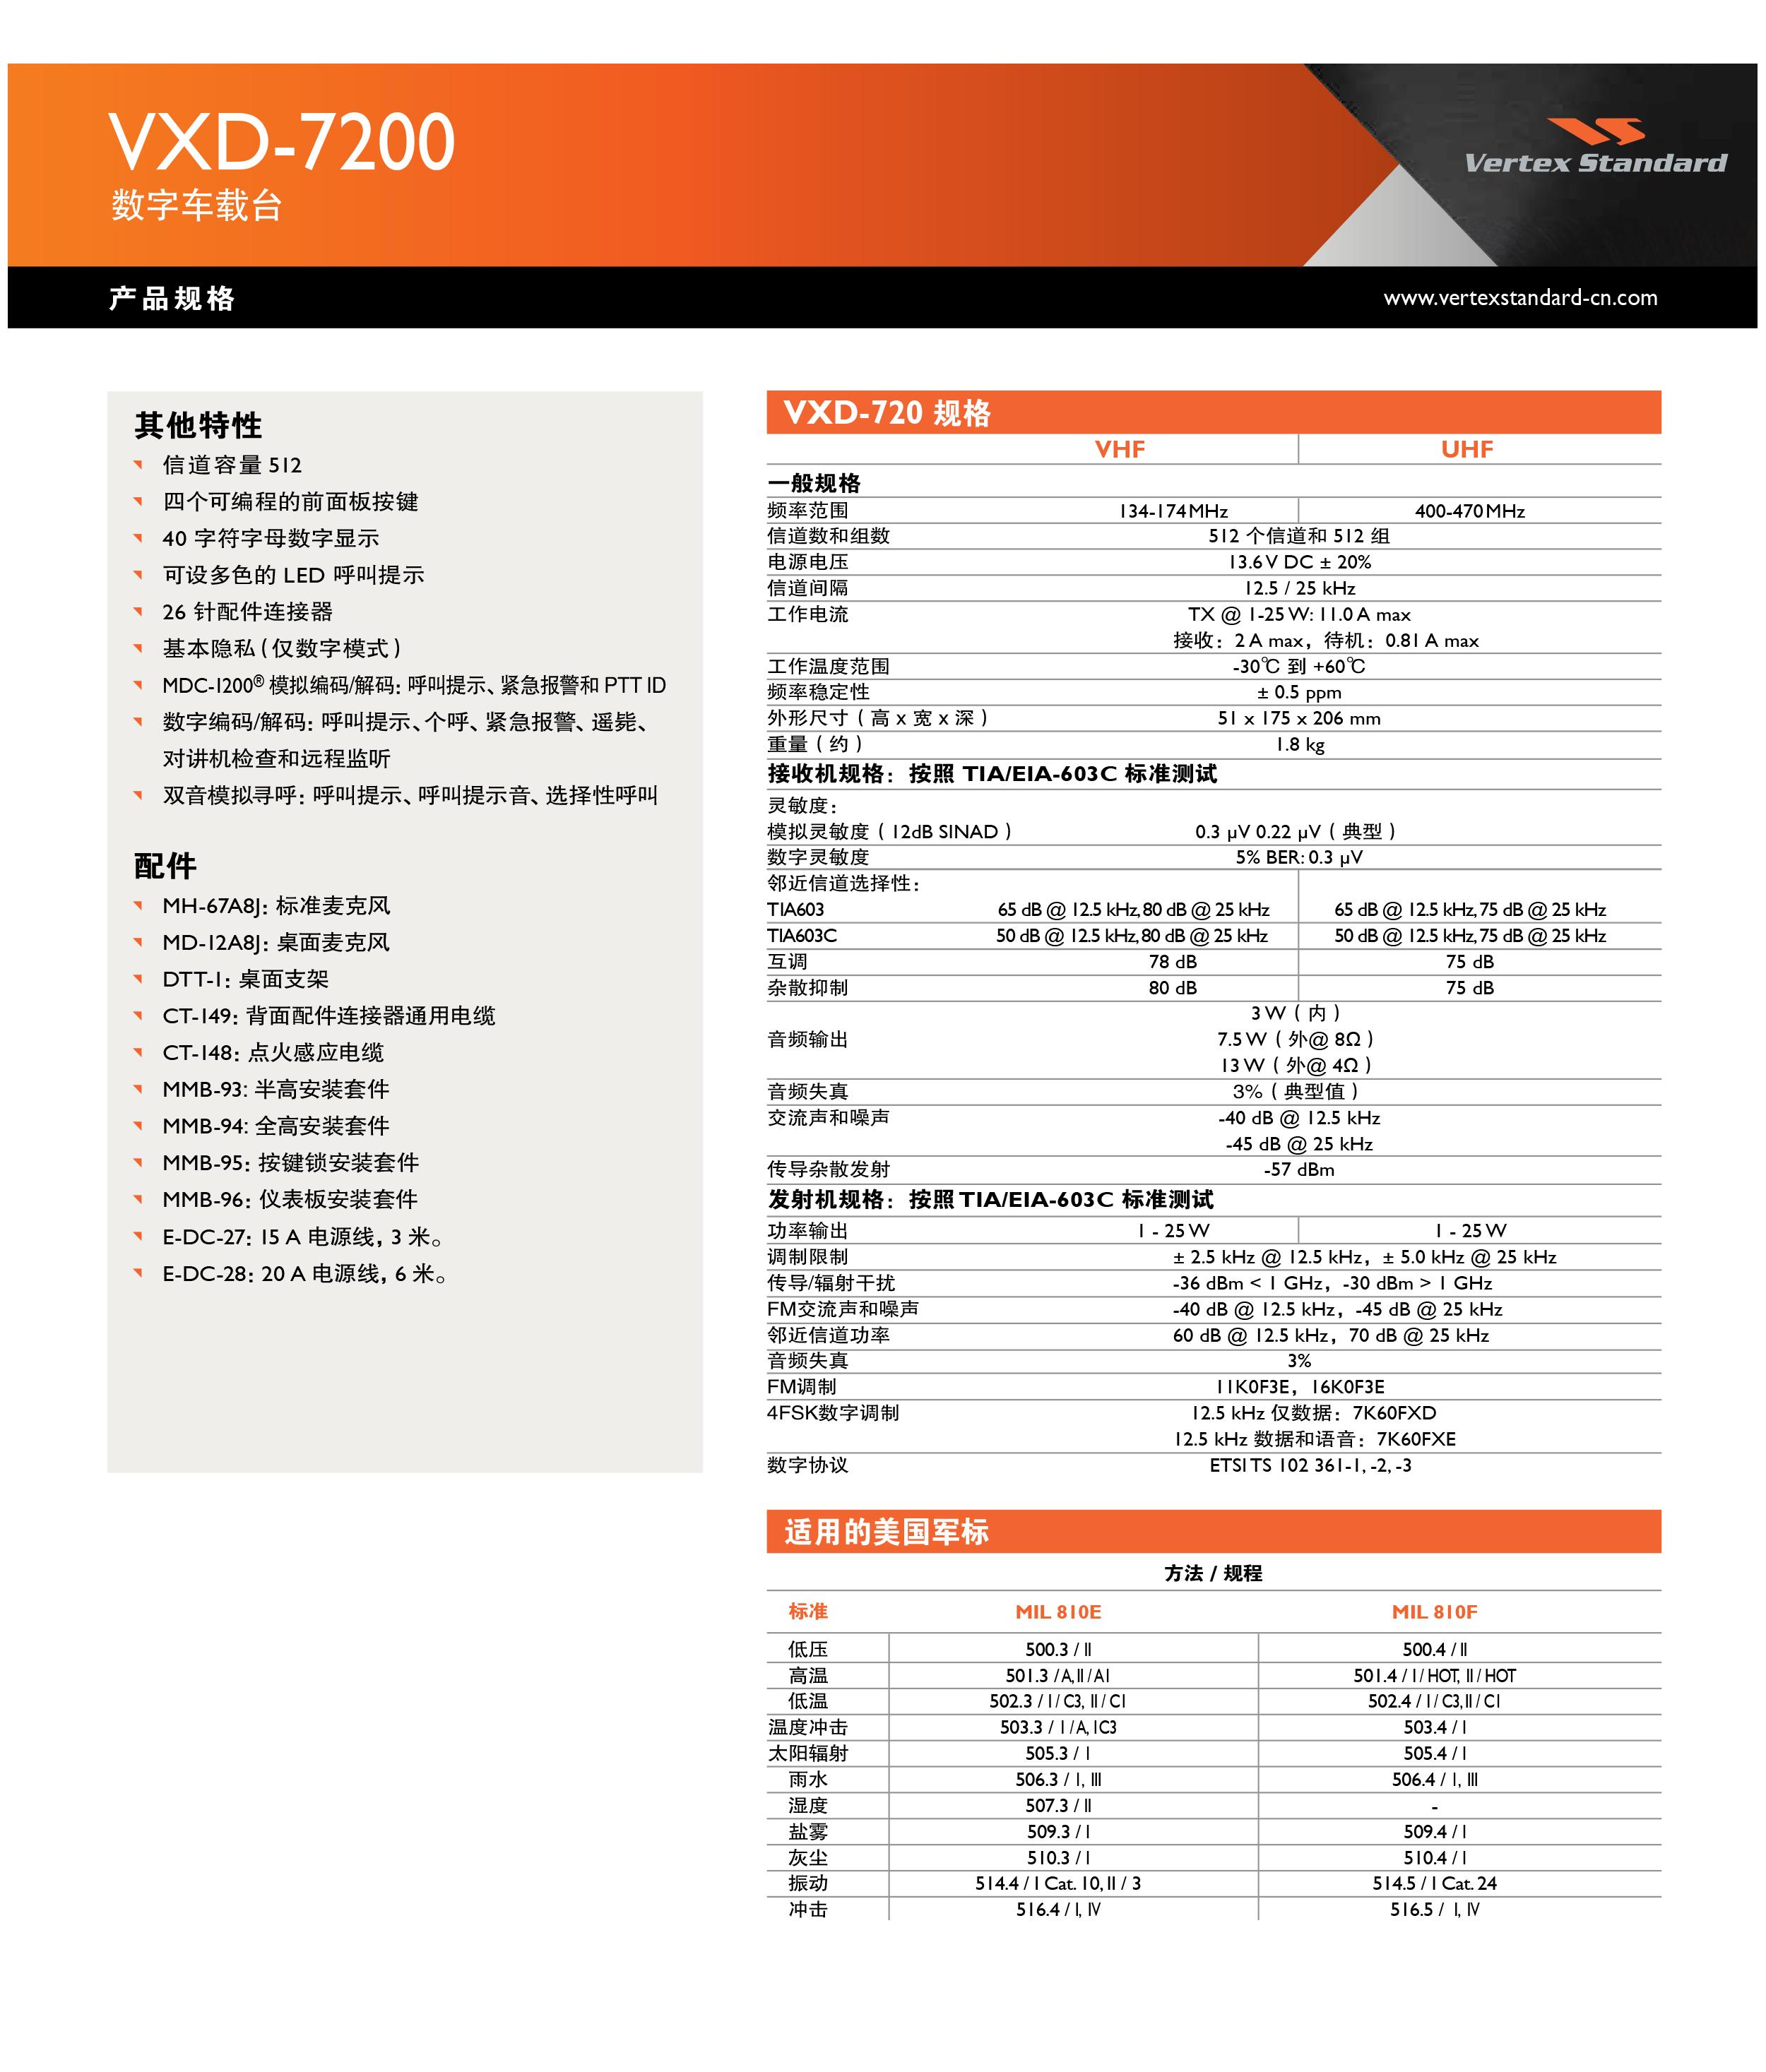 VXD-7200彩页_02